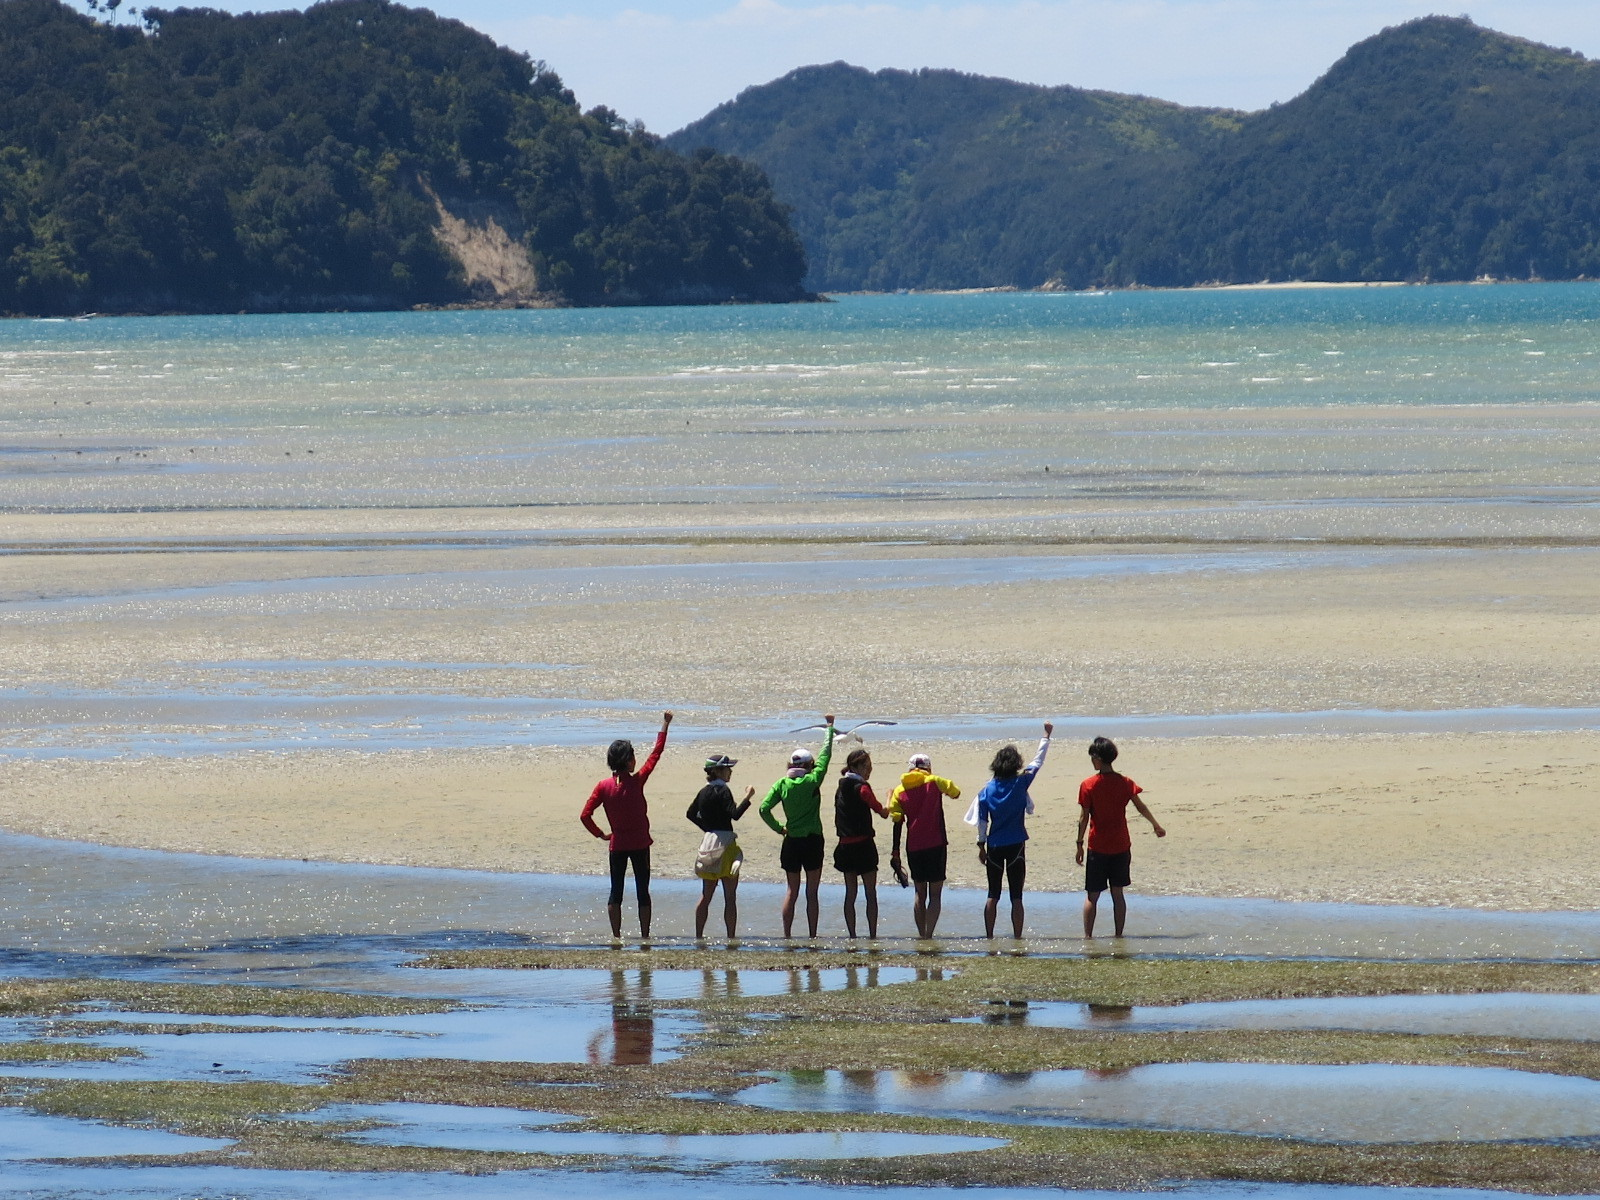 Abel Tasman National Park 未舗装のトレイルとビーチなど